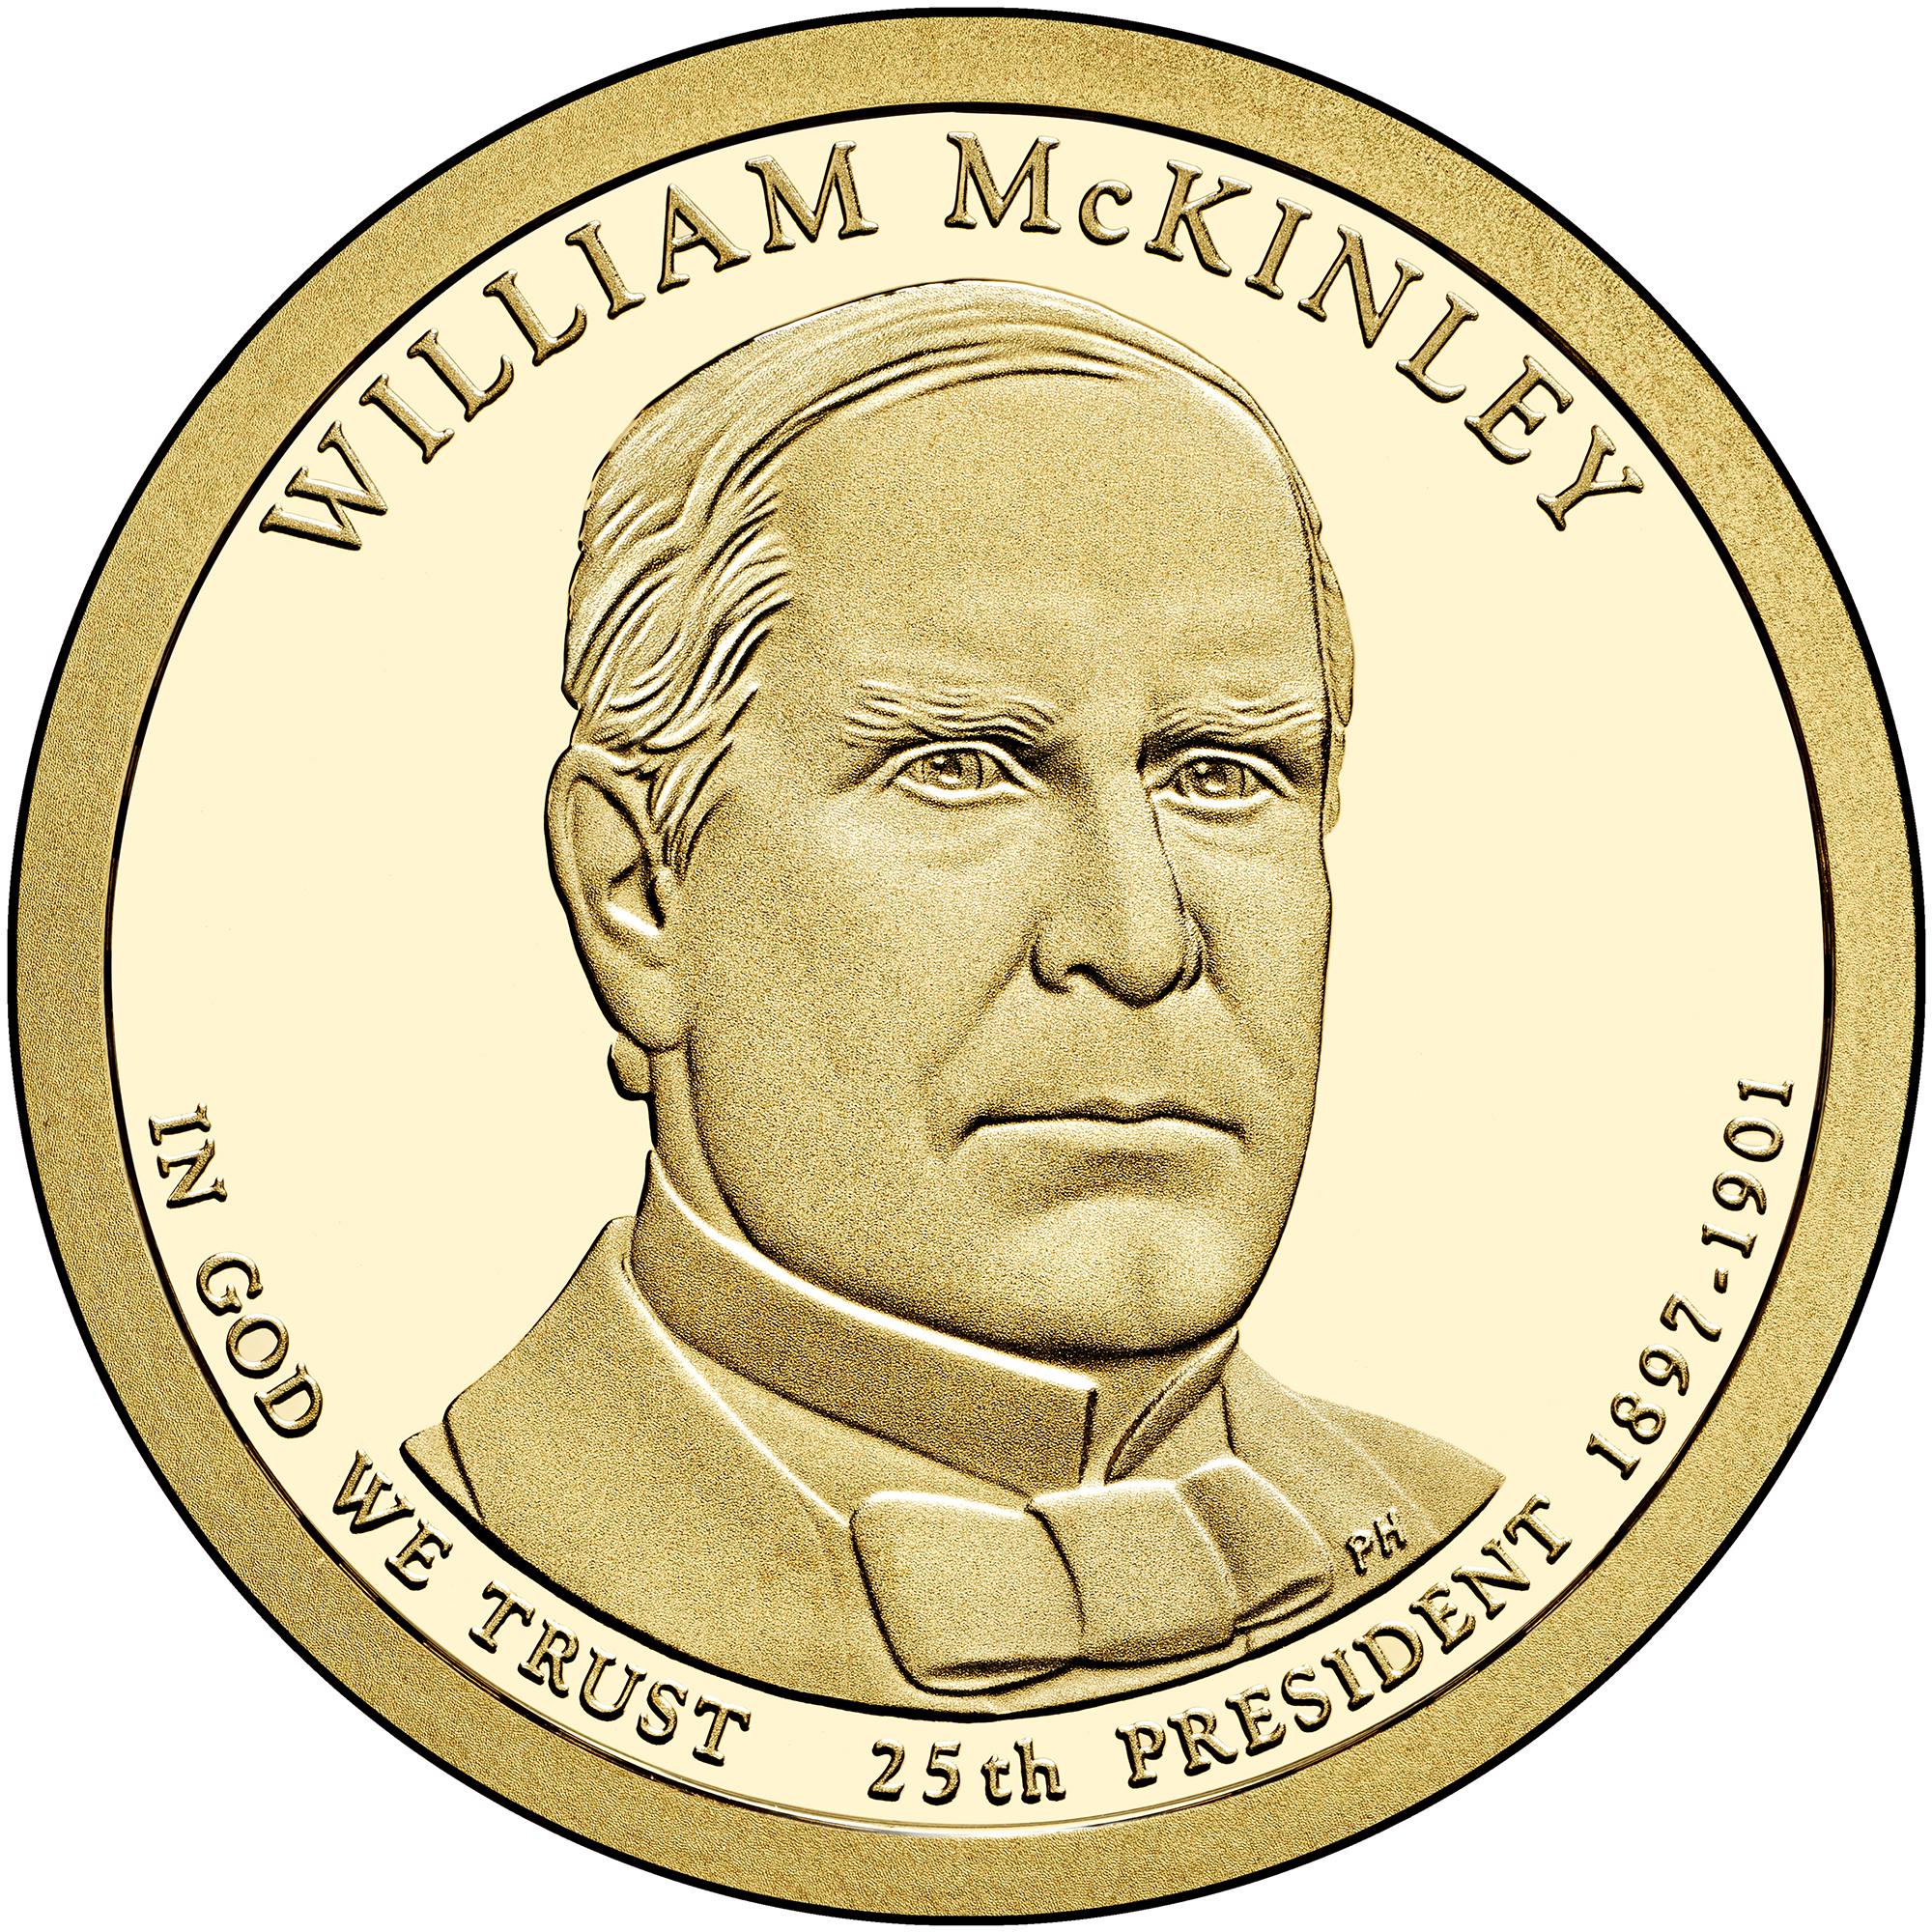 2013 Presidential Dollar Coin William Mckinley Proof Obverse